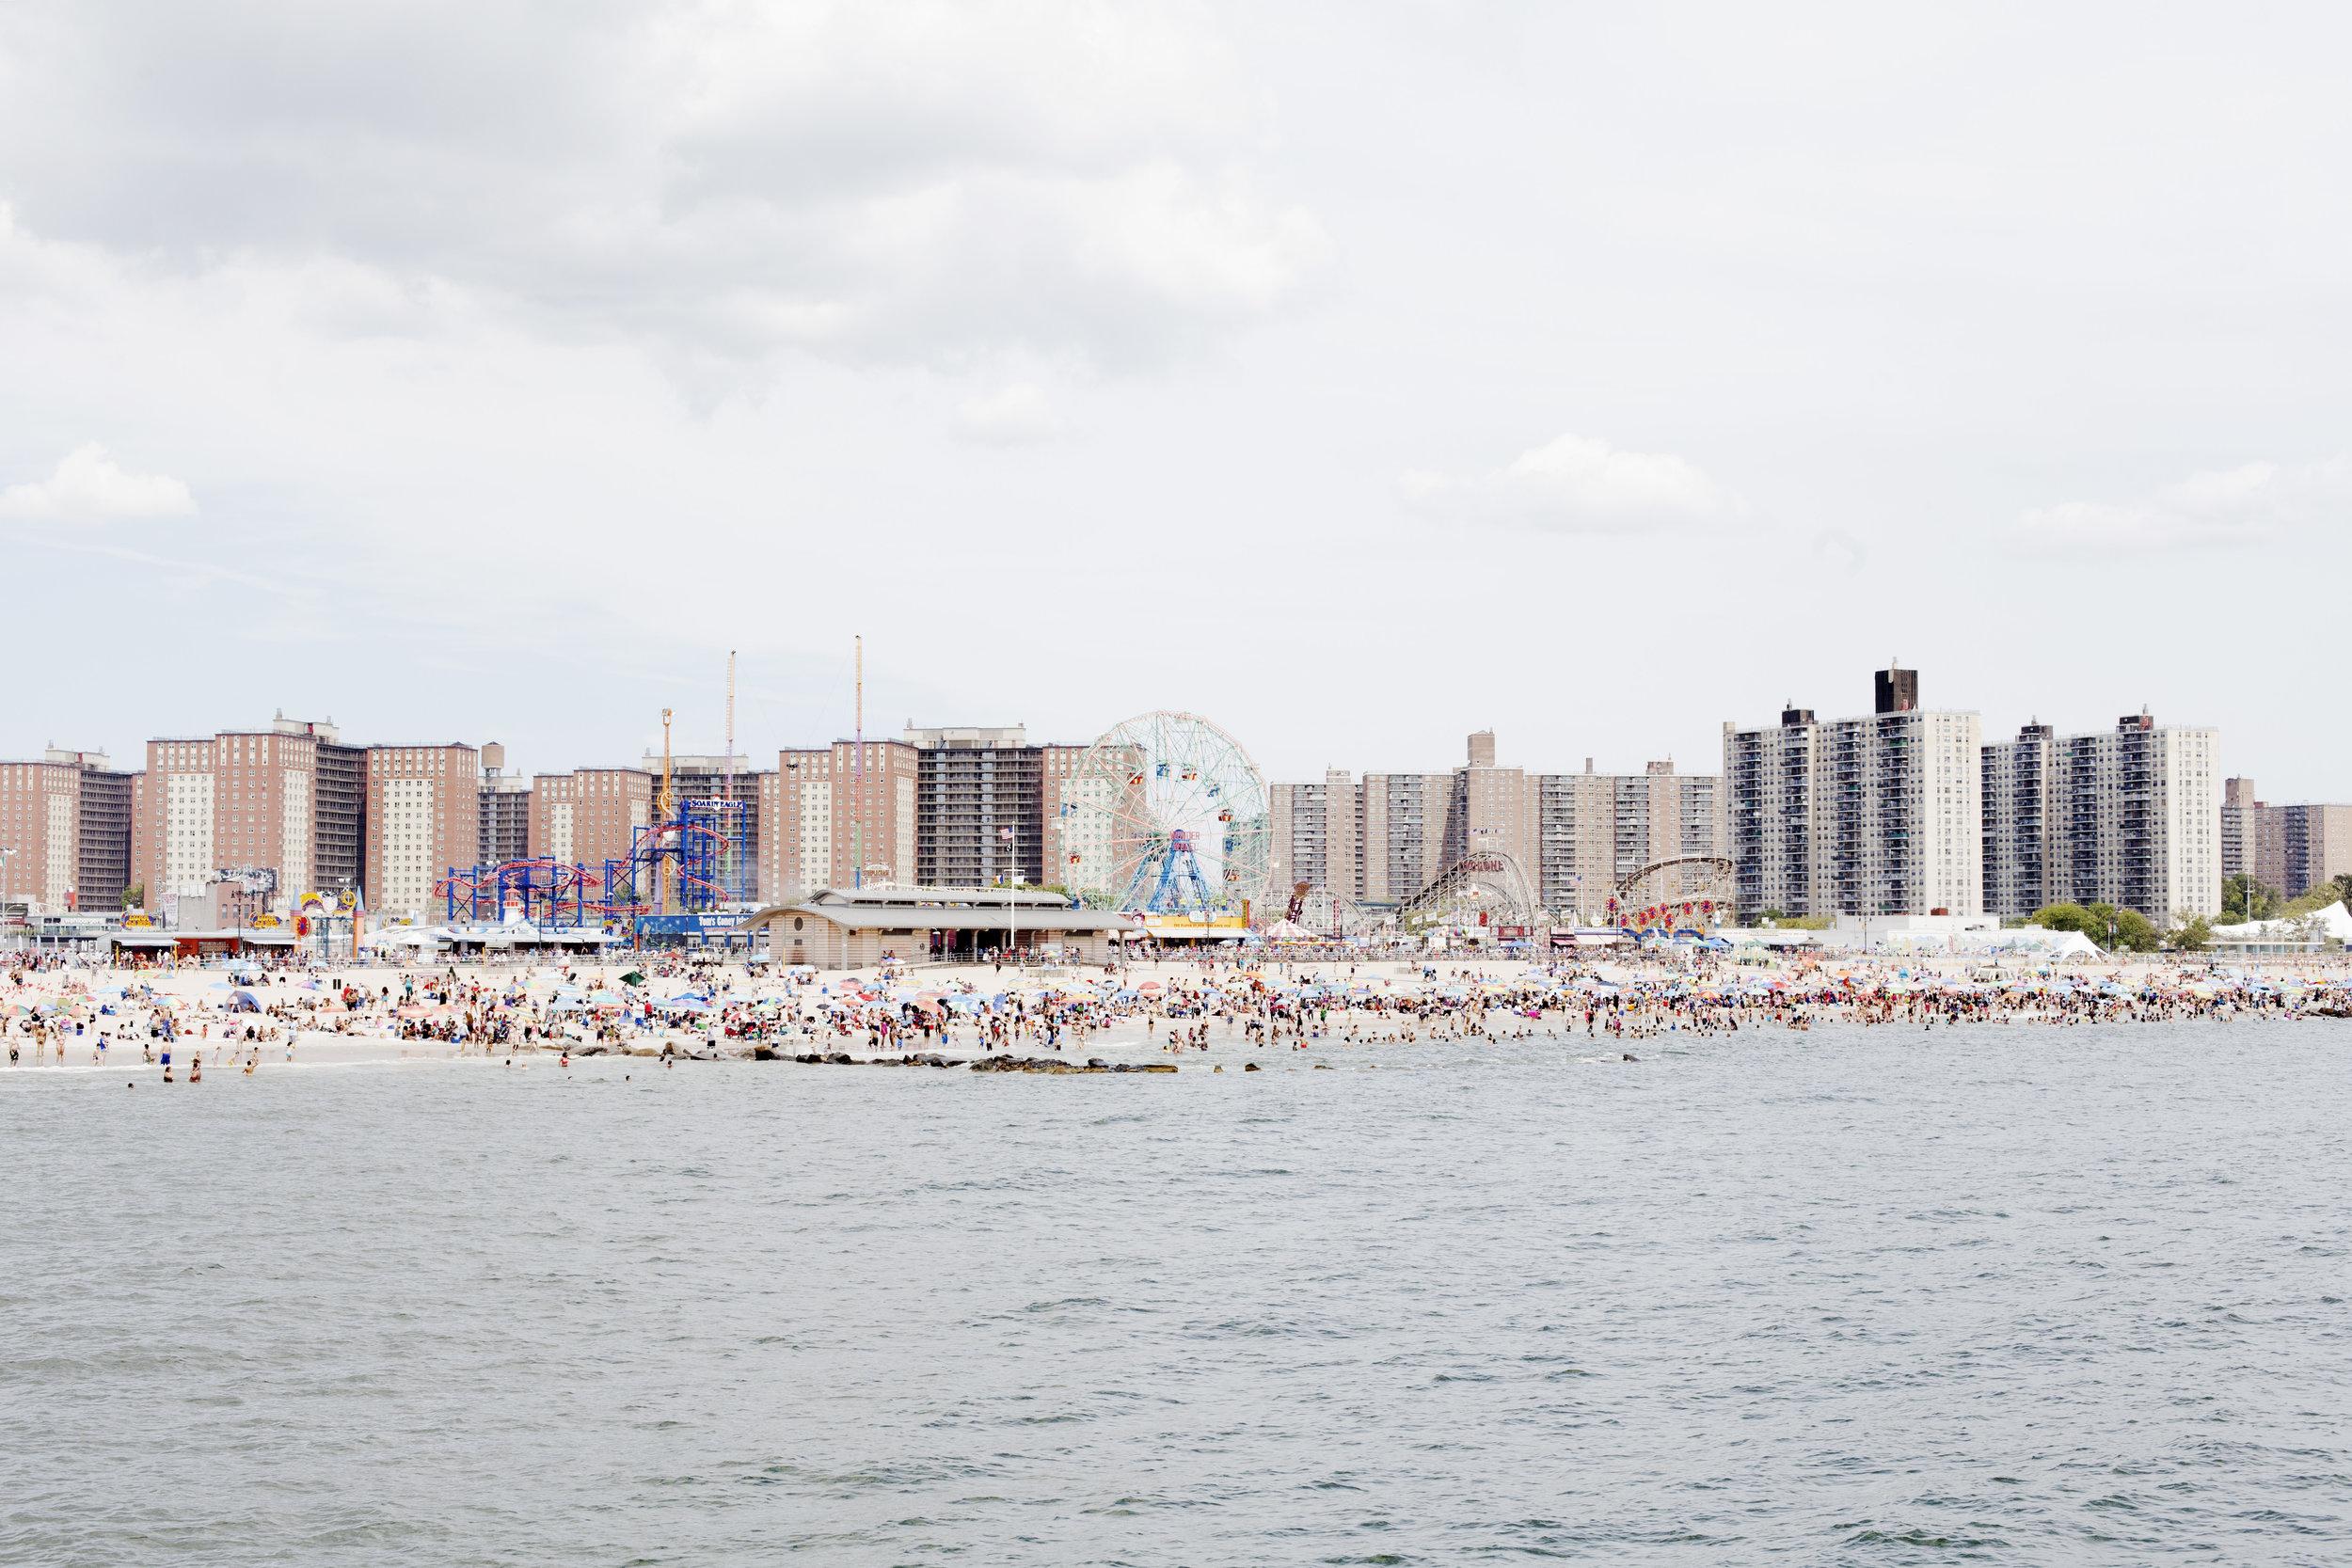 Coney_island_34.jpg